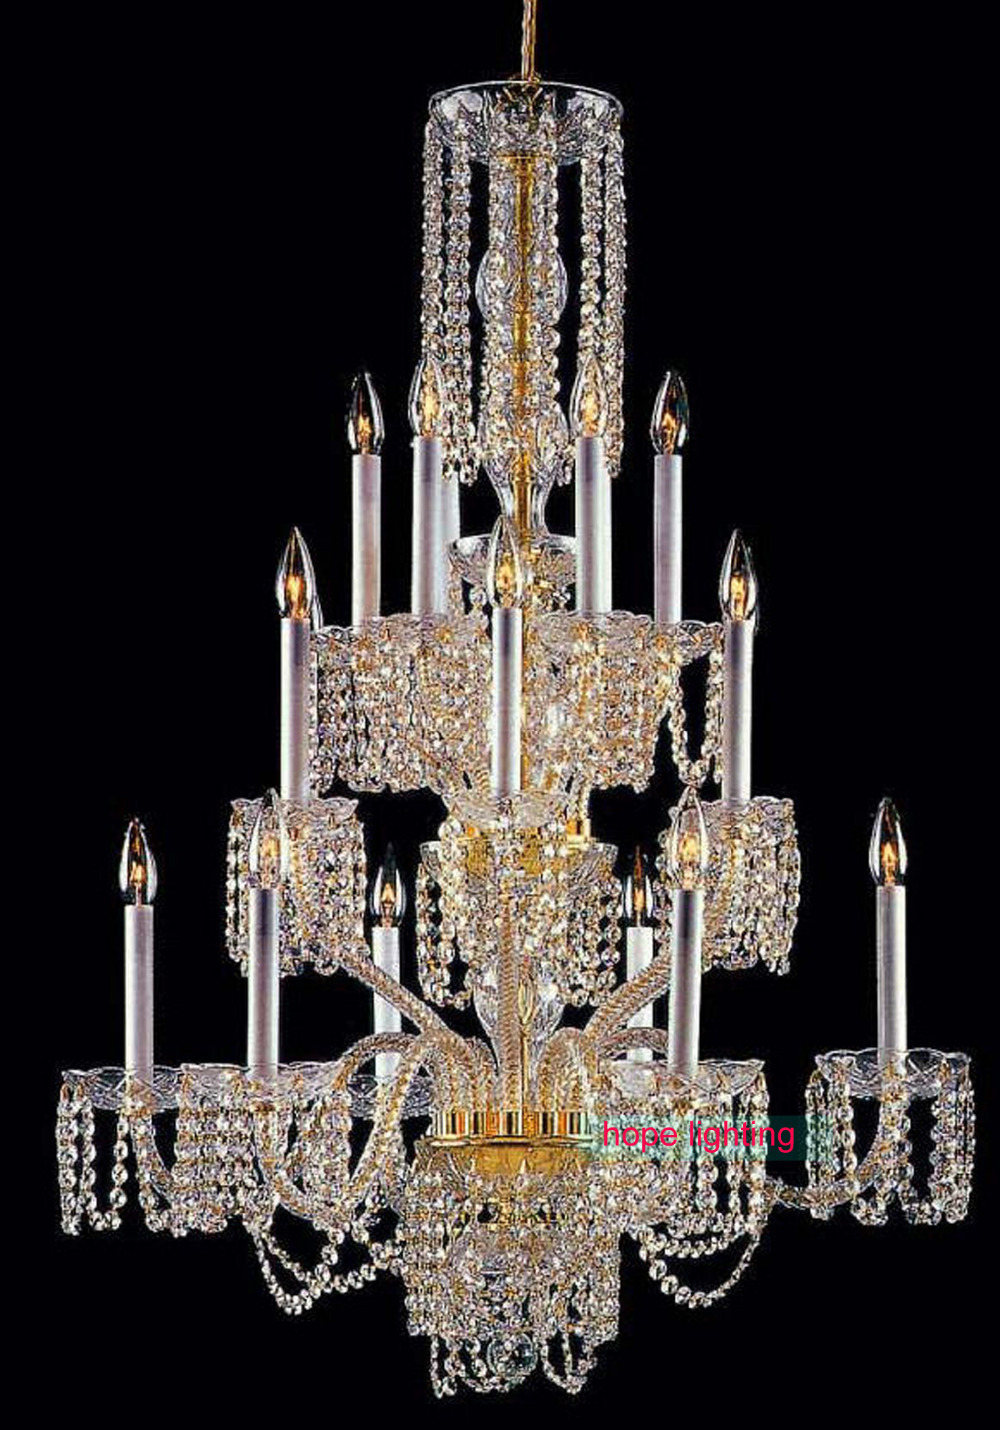 Contemporary Chandelier Lighting Decorative Chandelier Light elegant crystal lighting living room Elegant crystal chandeliers